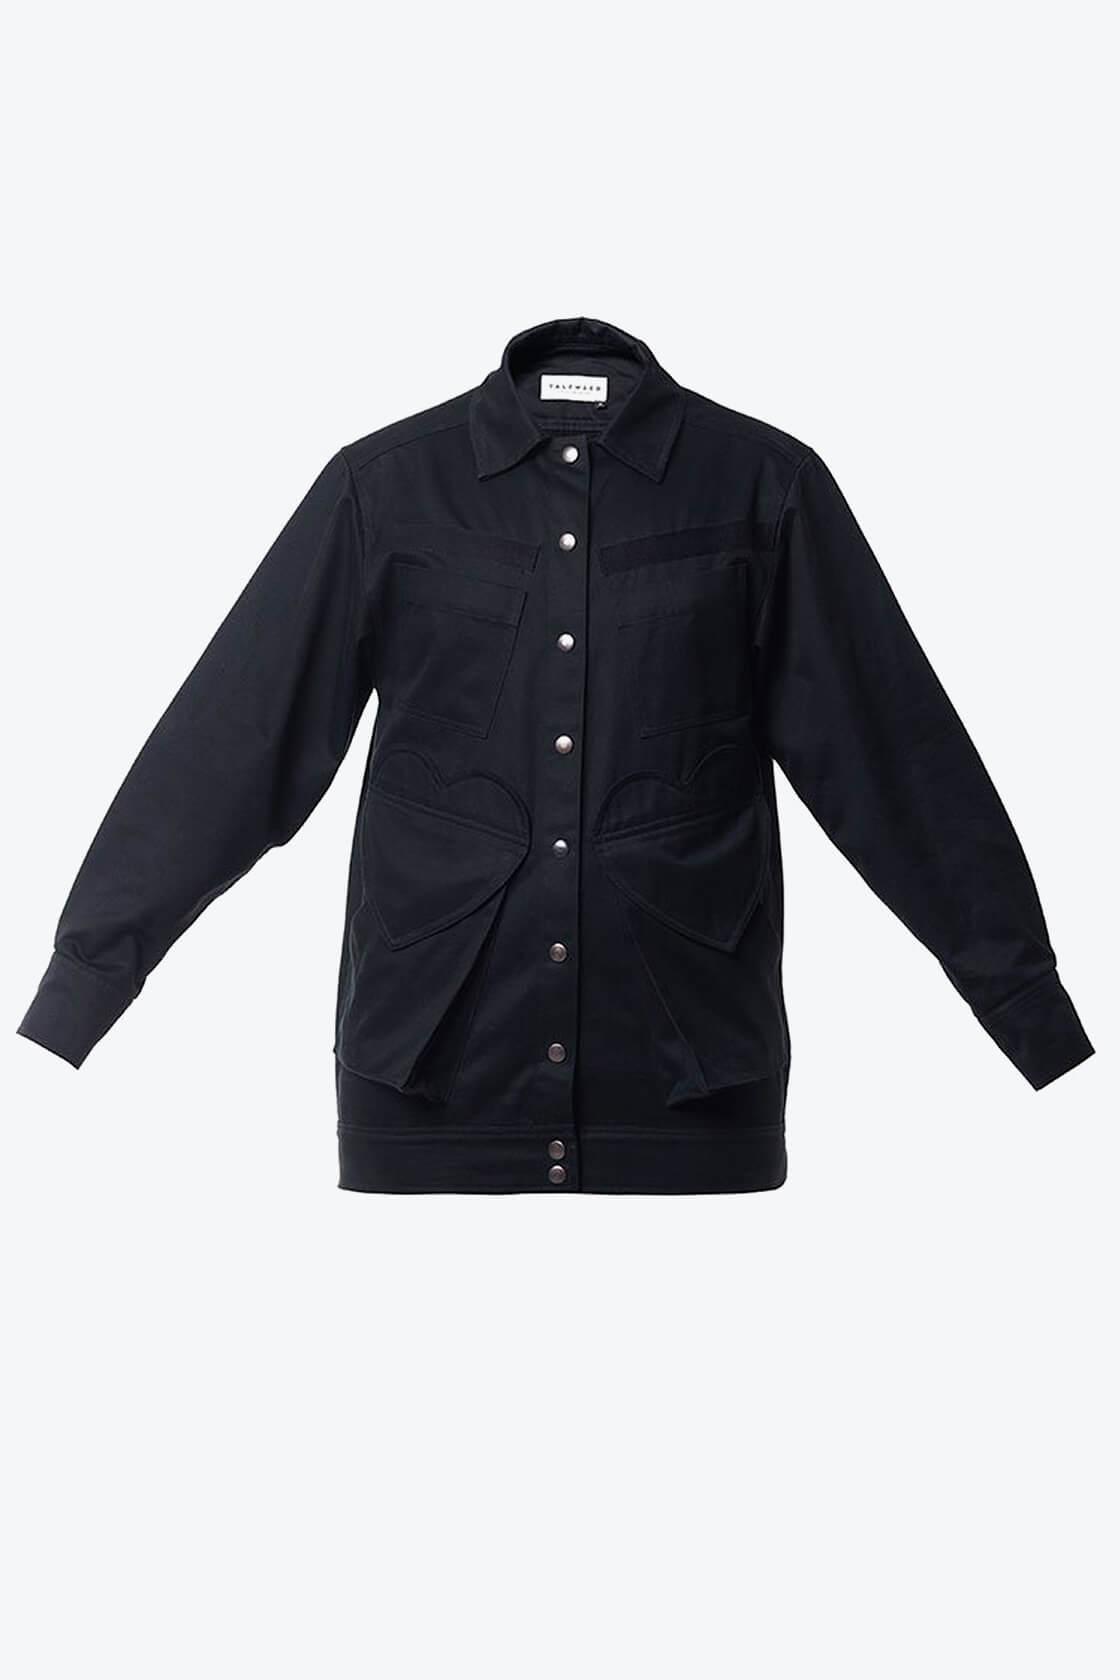 OL10000228 Black denim jacket1